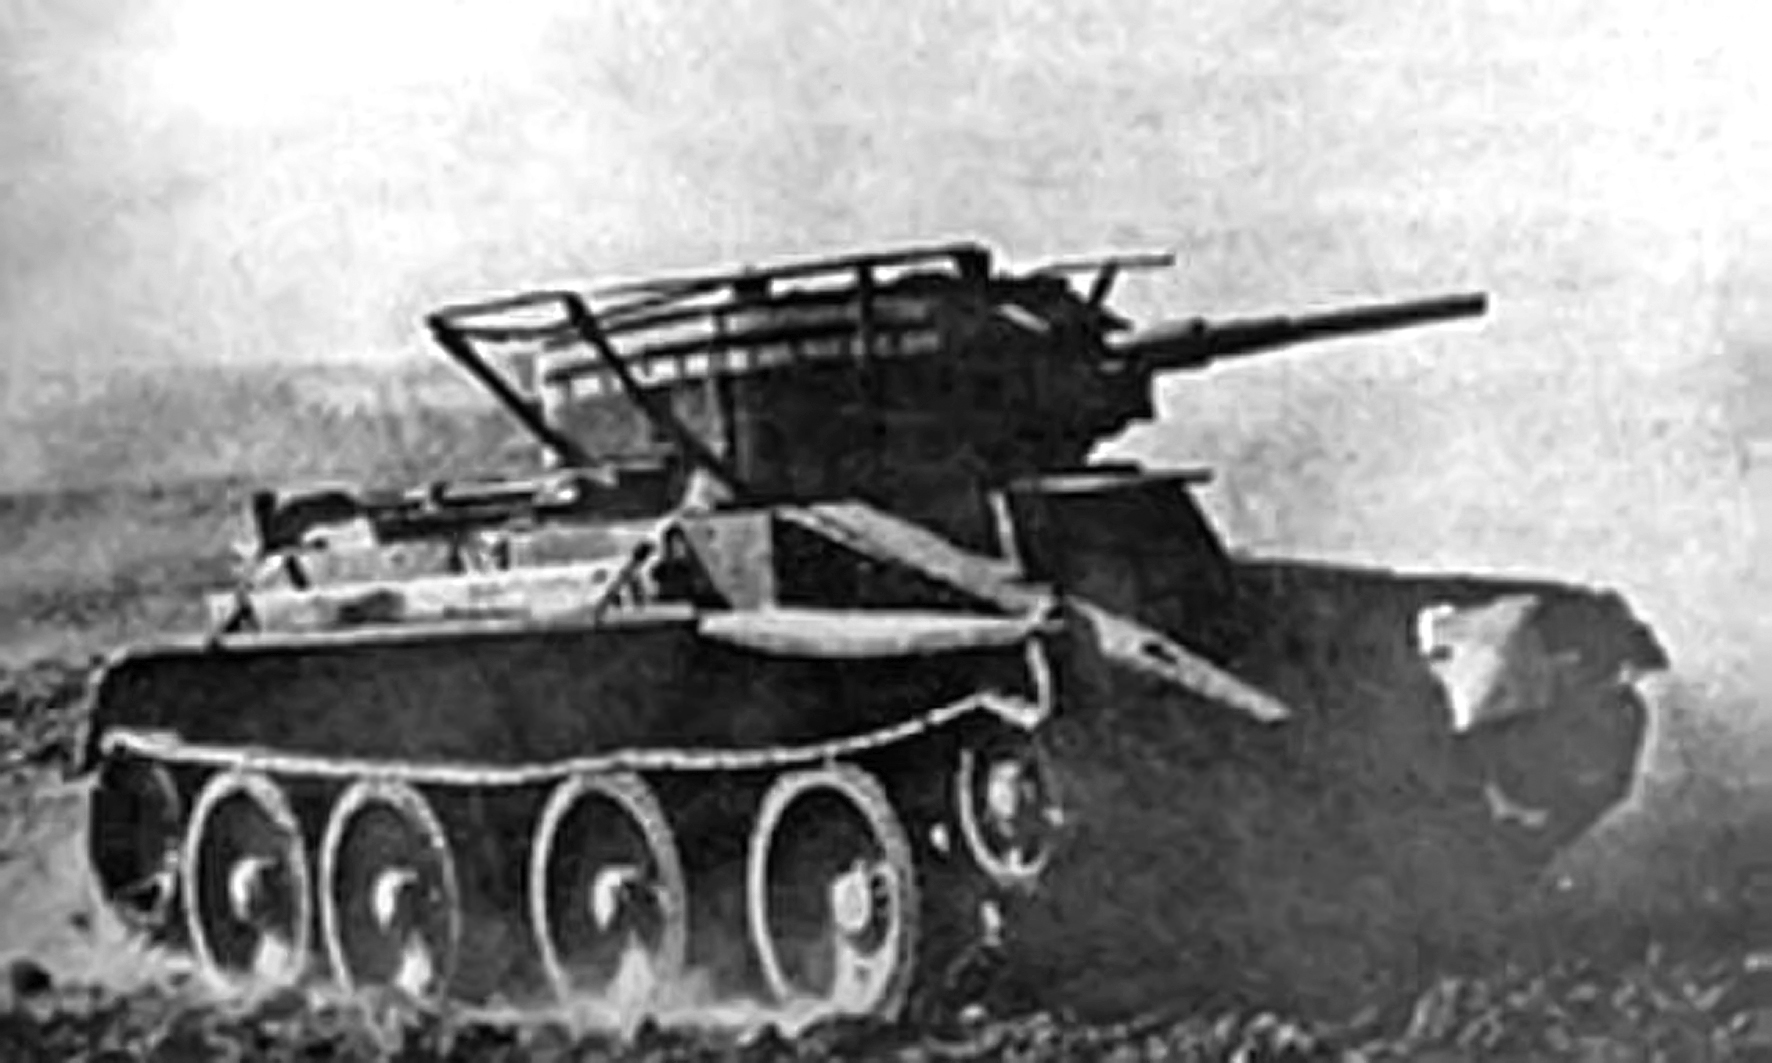 Нарисовать танк поэтапно из world of tanks